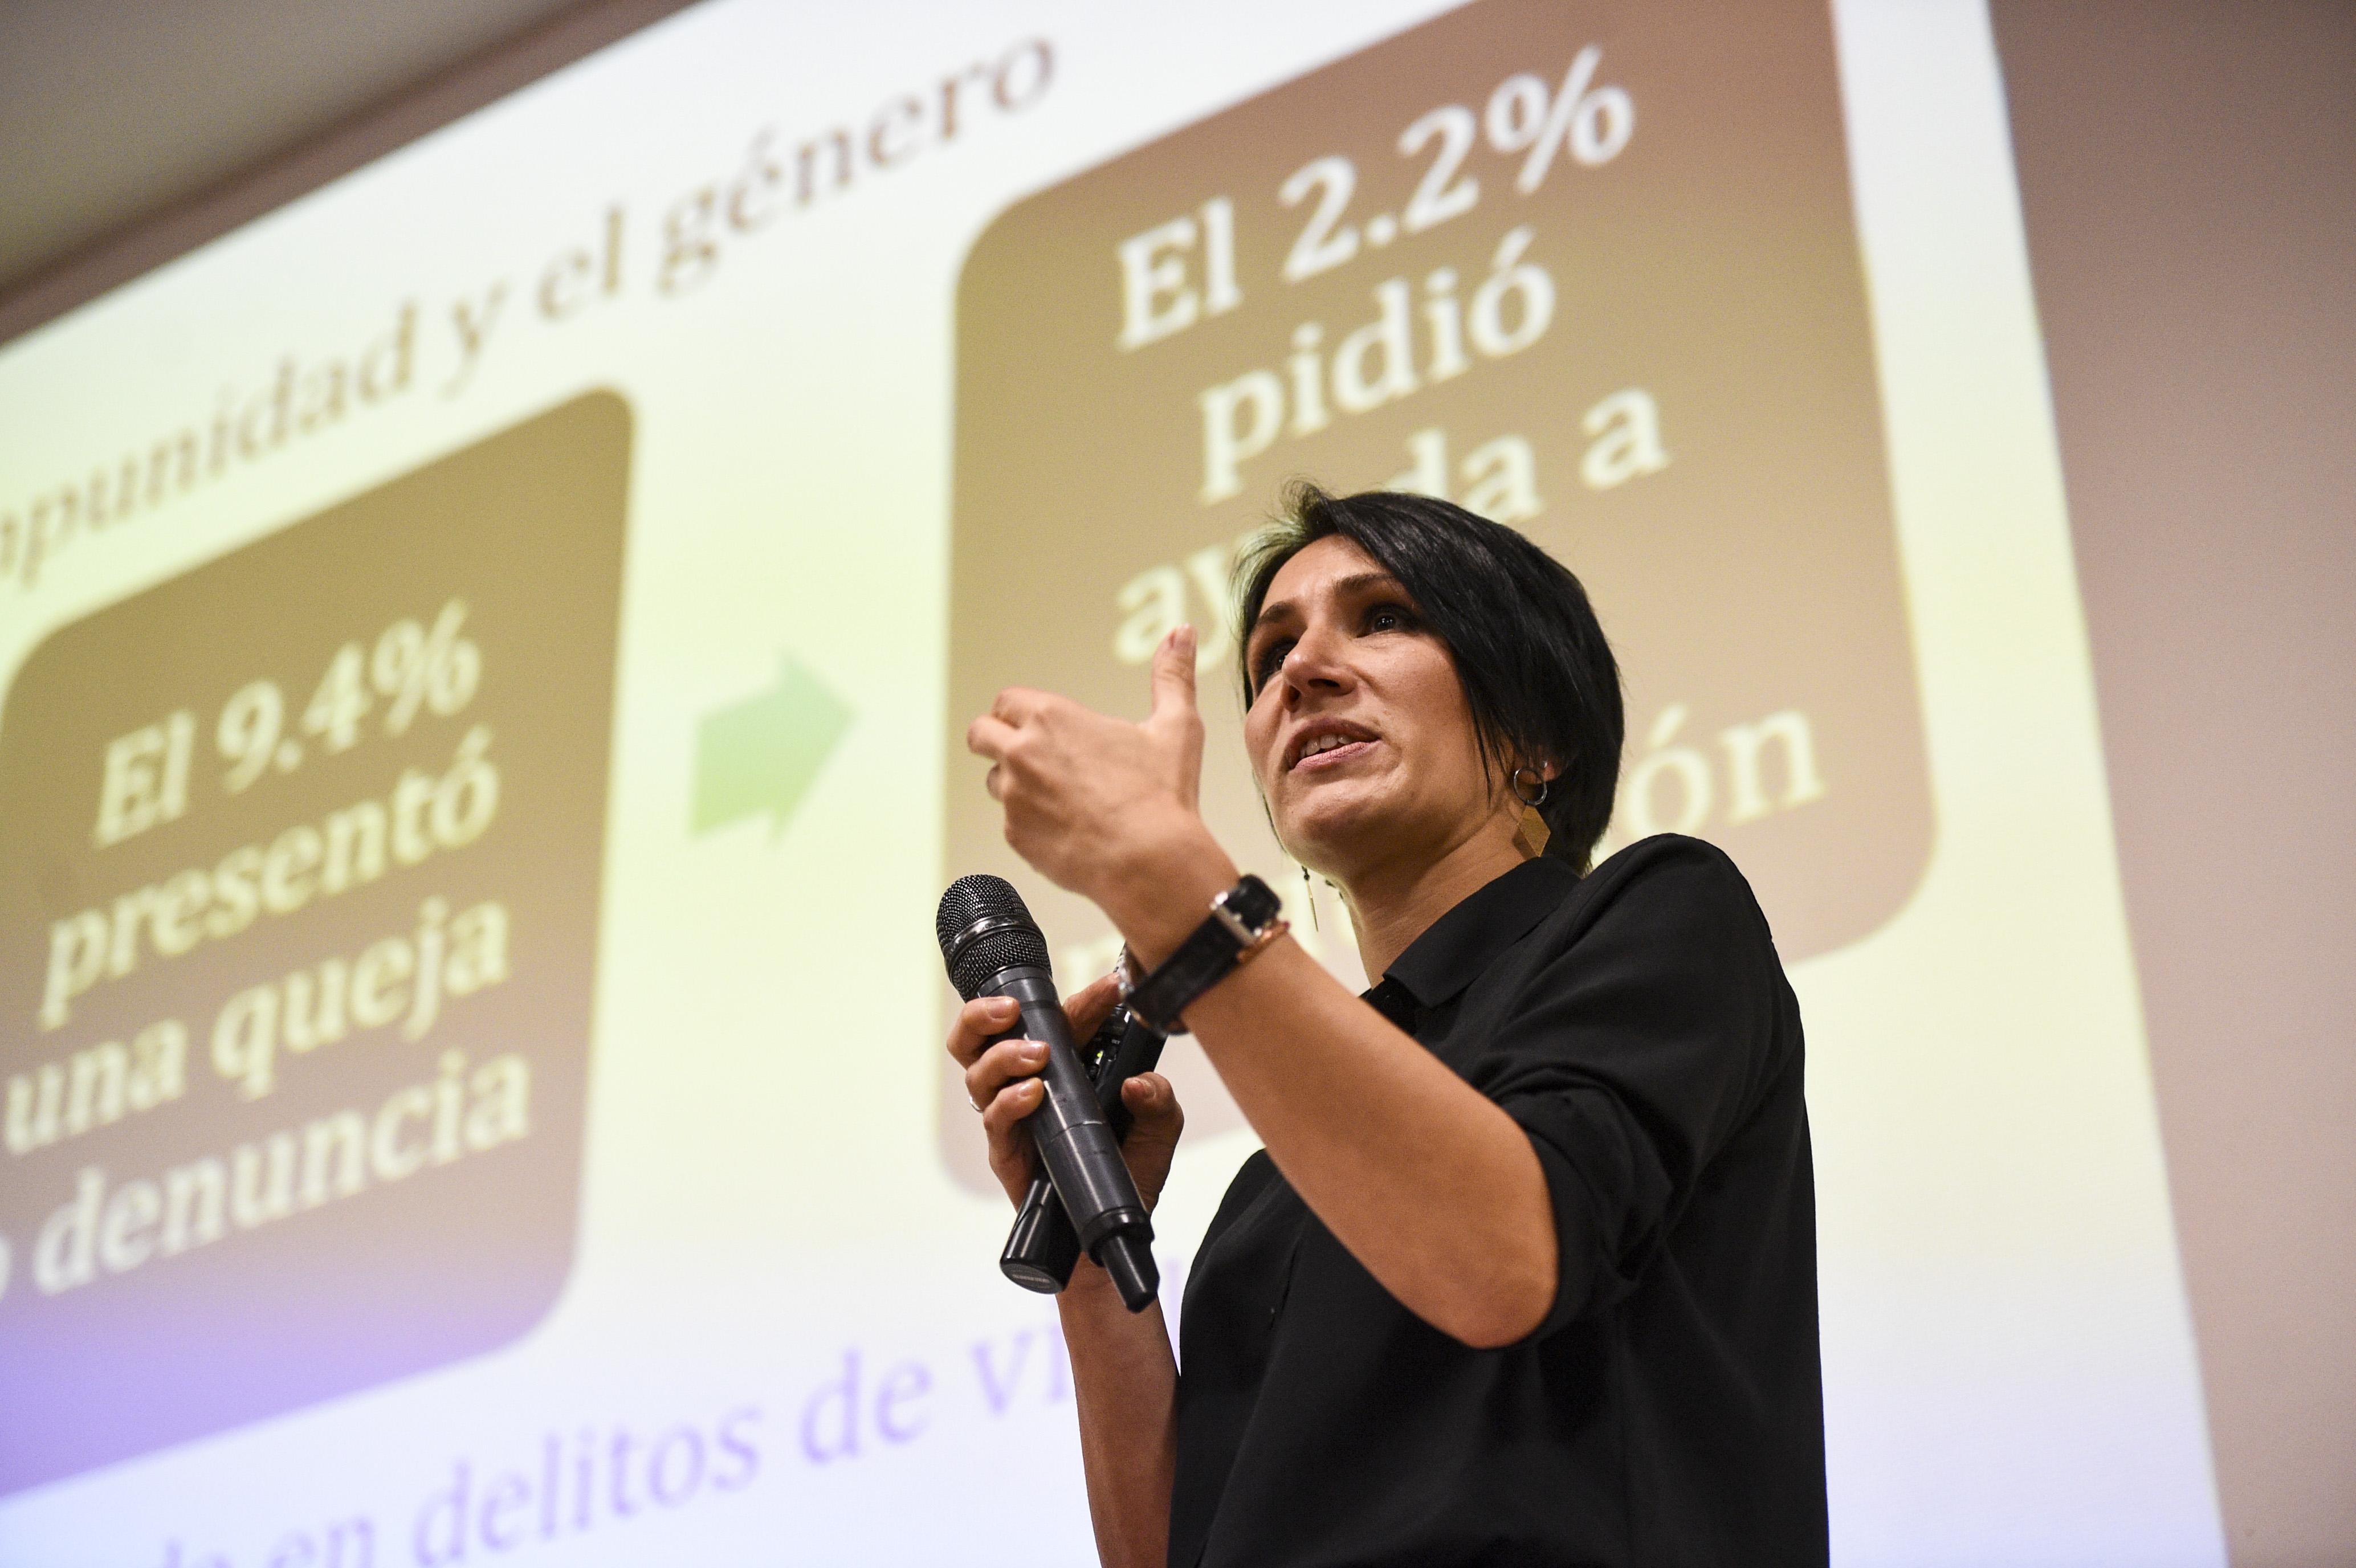 Dra Ana Pecova dictando conferencia 2